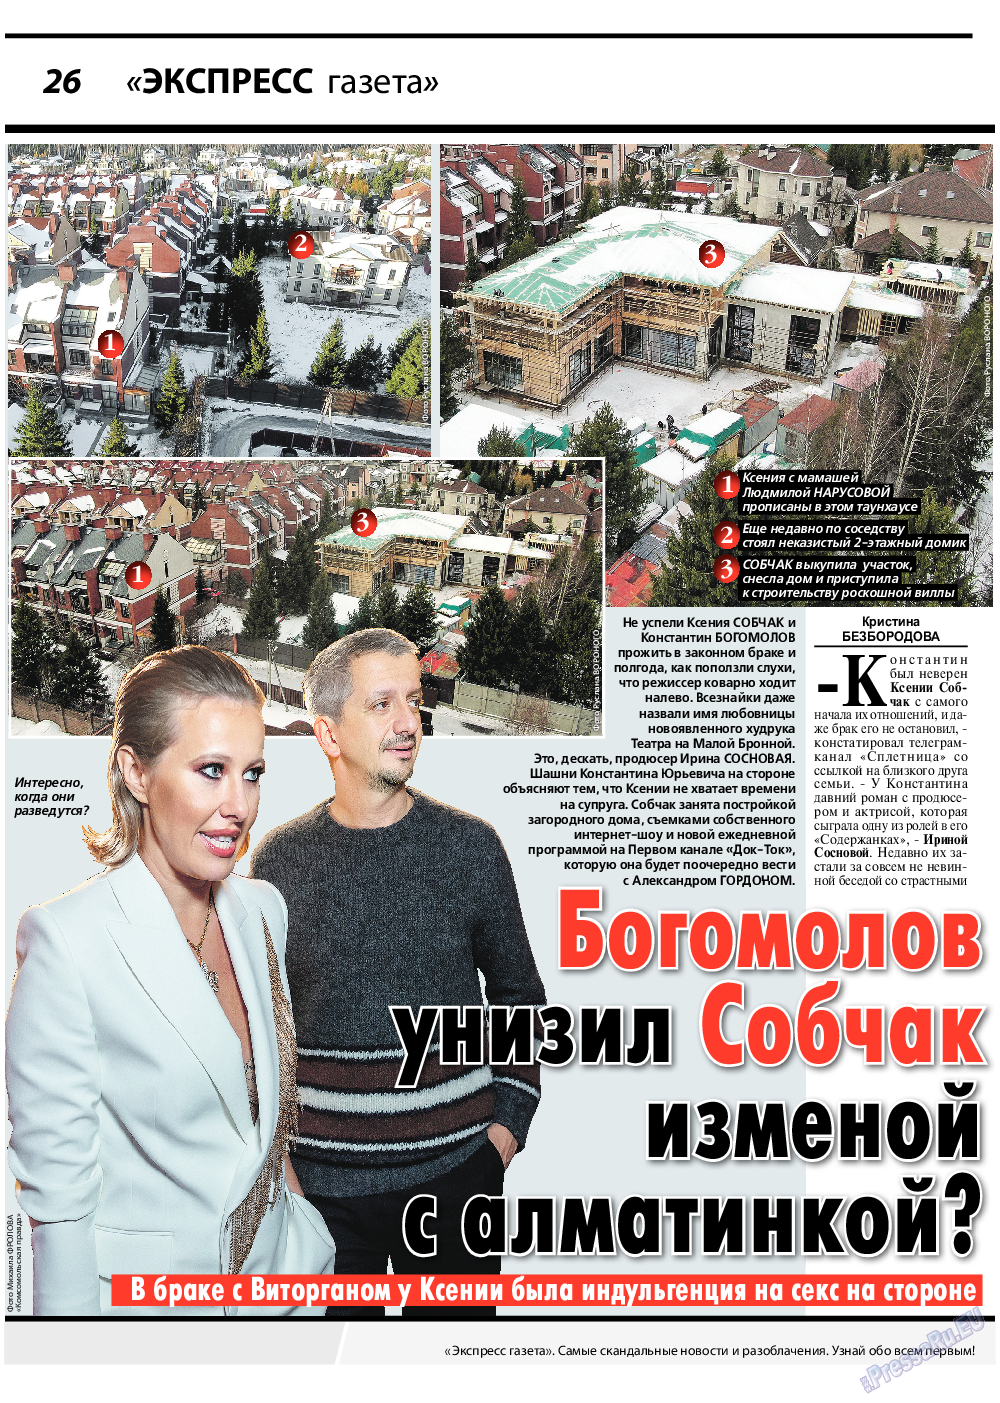 Экспресс газета (газета). 2020 год, номер 4, стр. 26